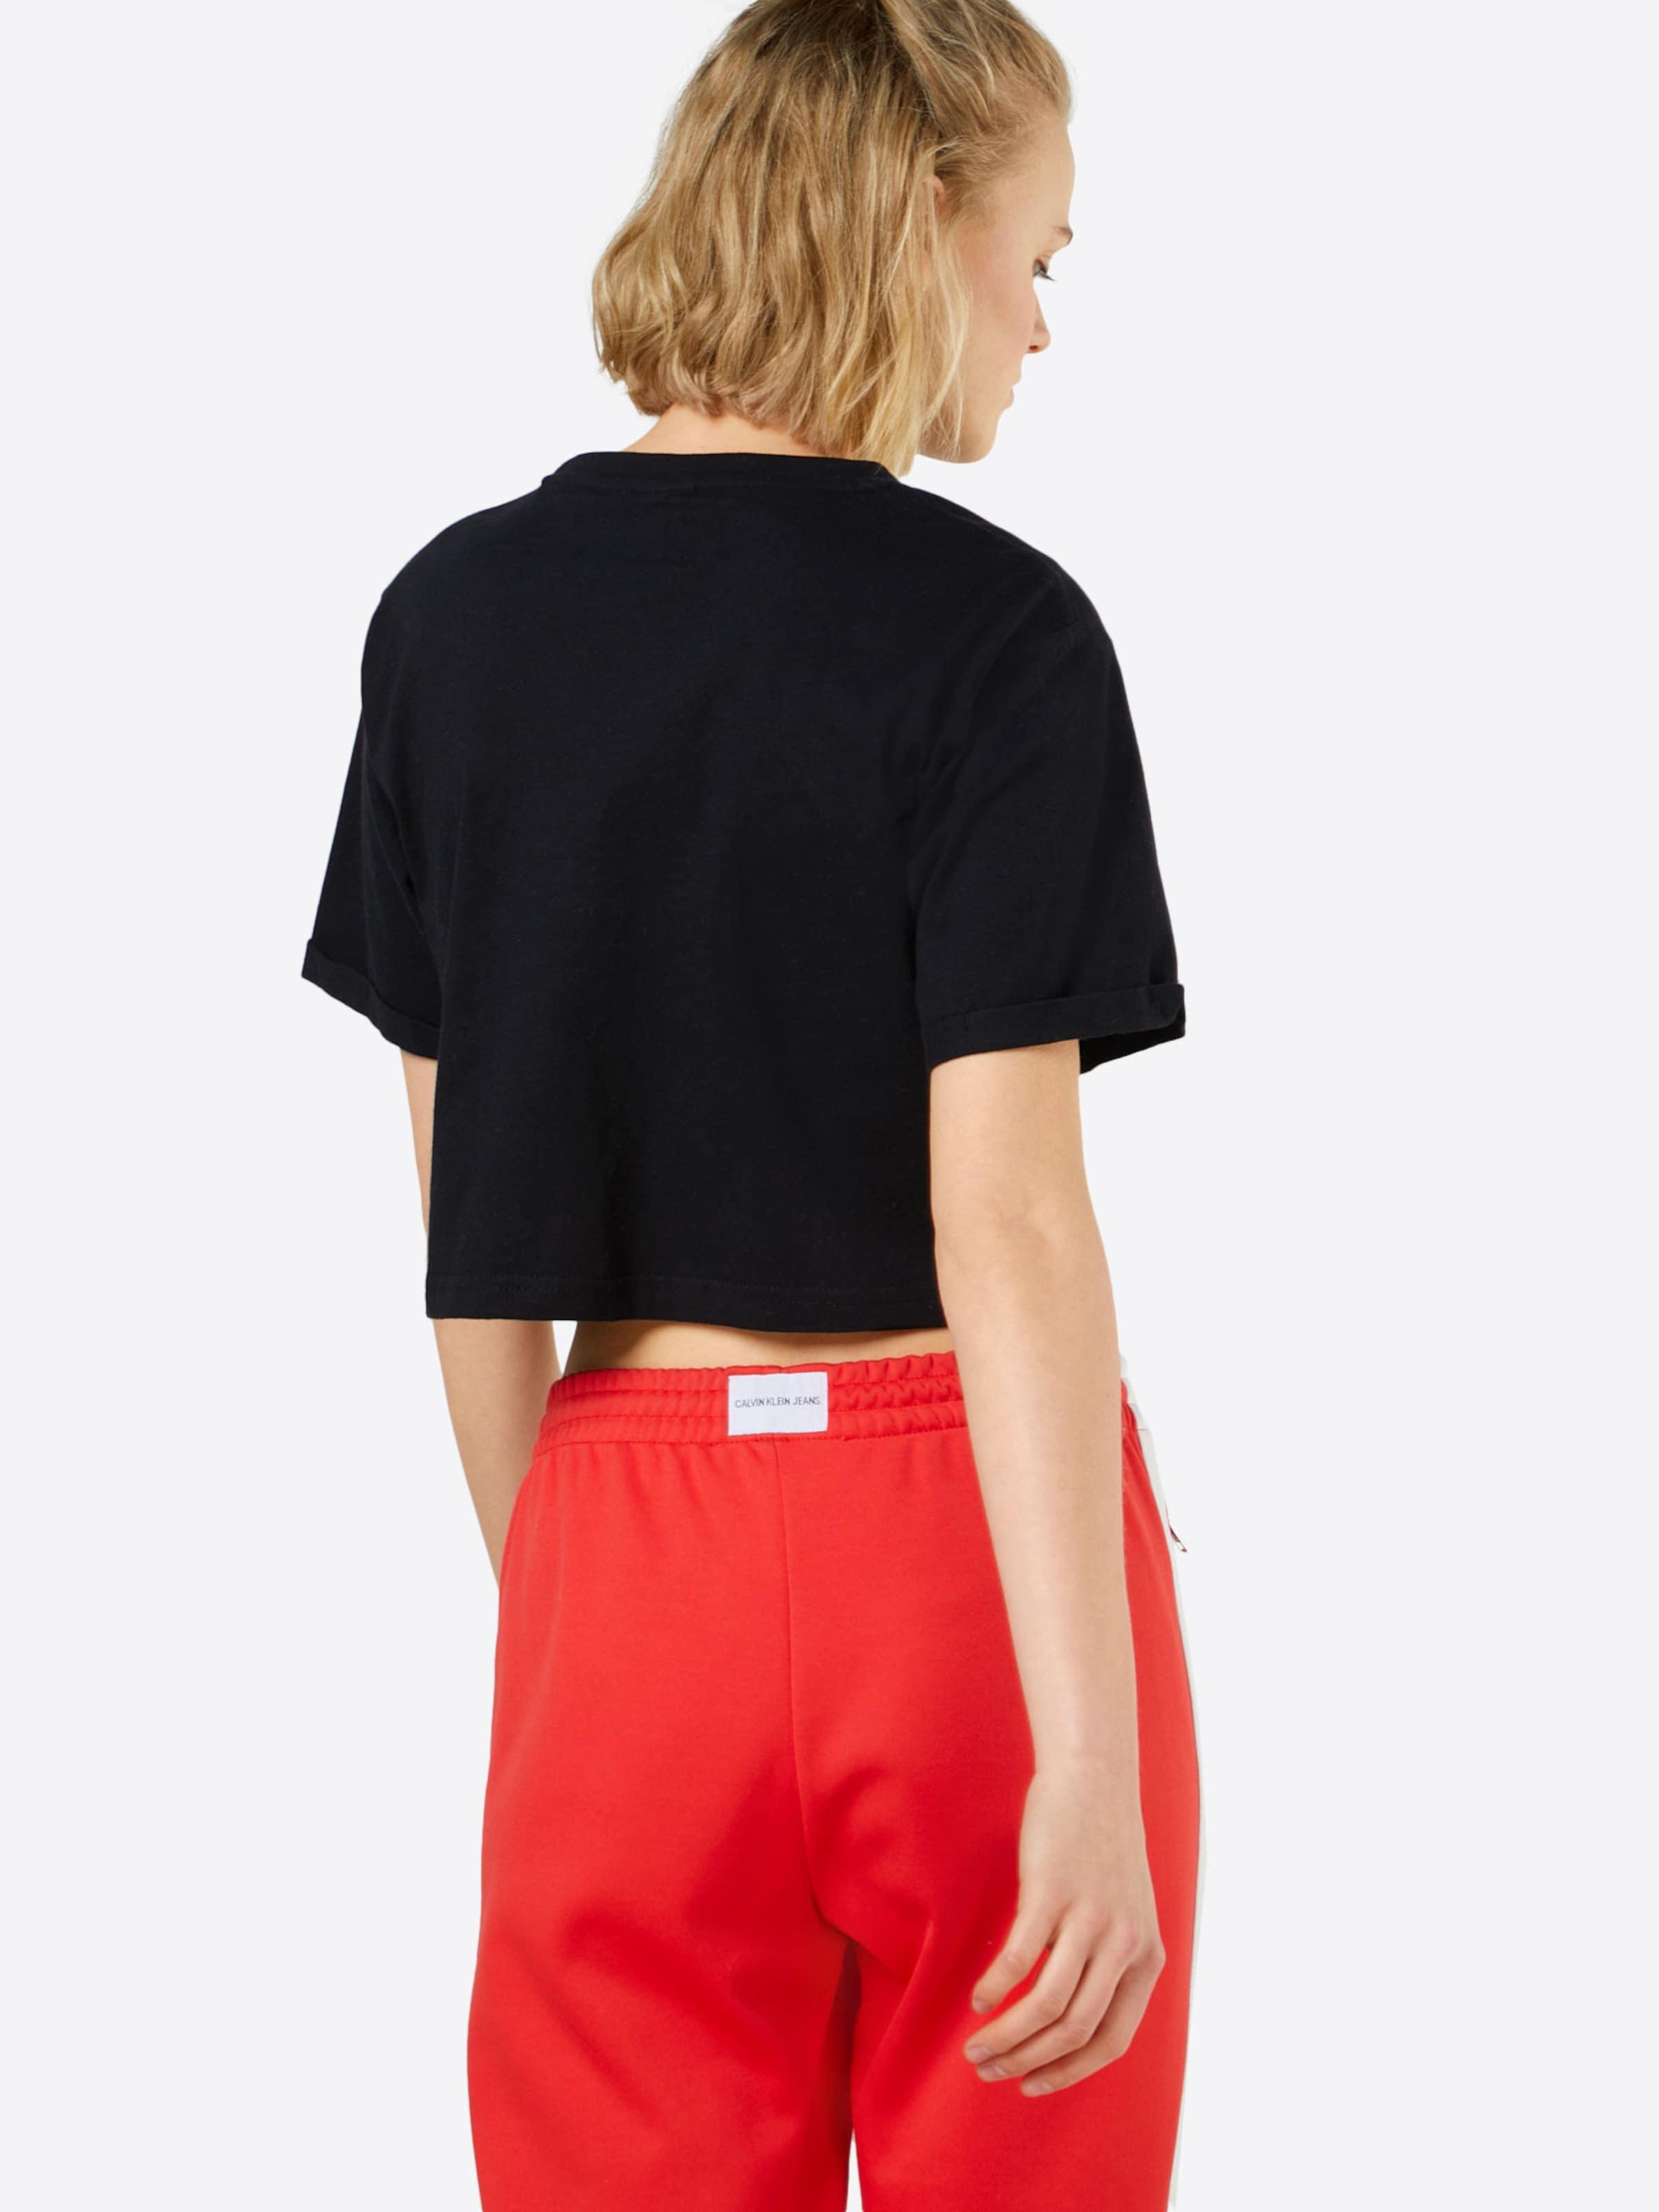 Ellesse Noir Blanc shirt T 'alberta' OrangeRouge En uTJ31FlKc